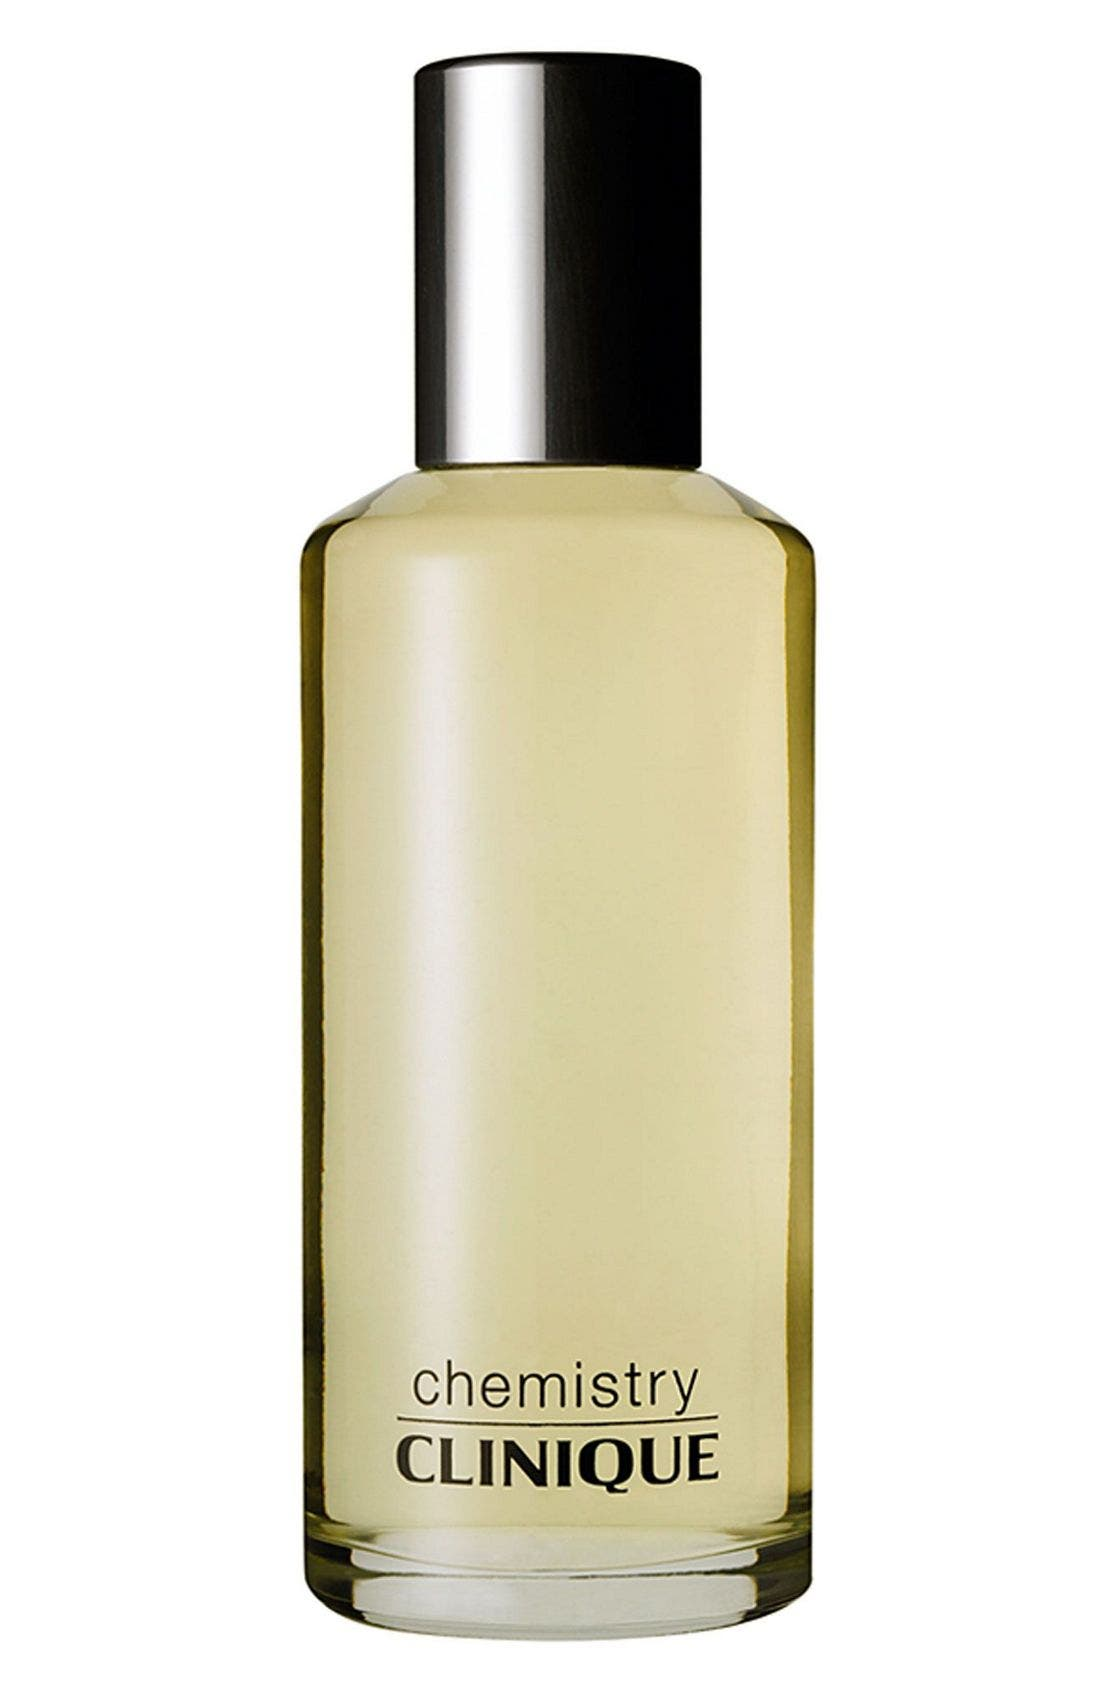 Clinique 'Chemistry' Skin Cologne for Men